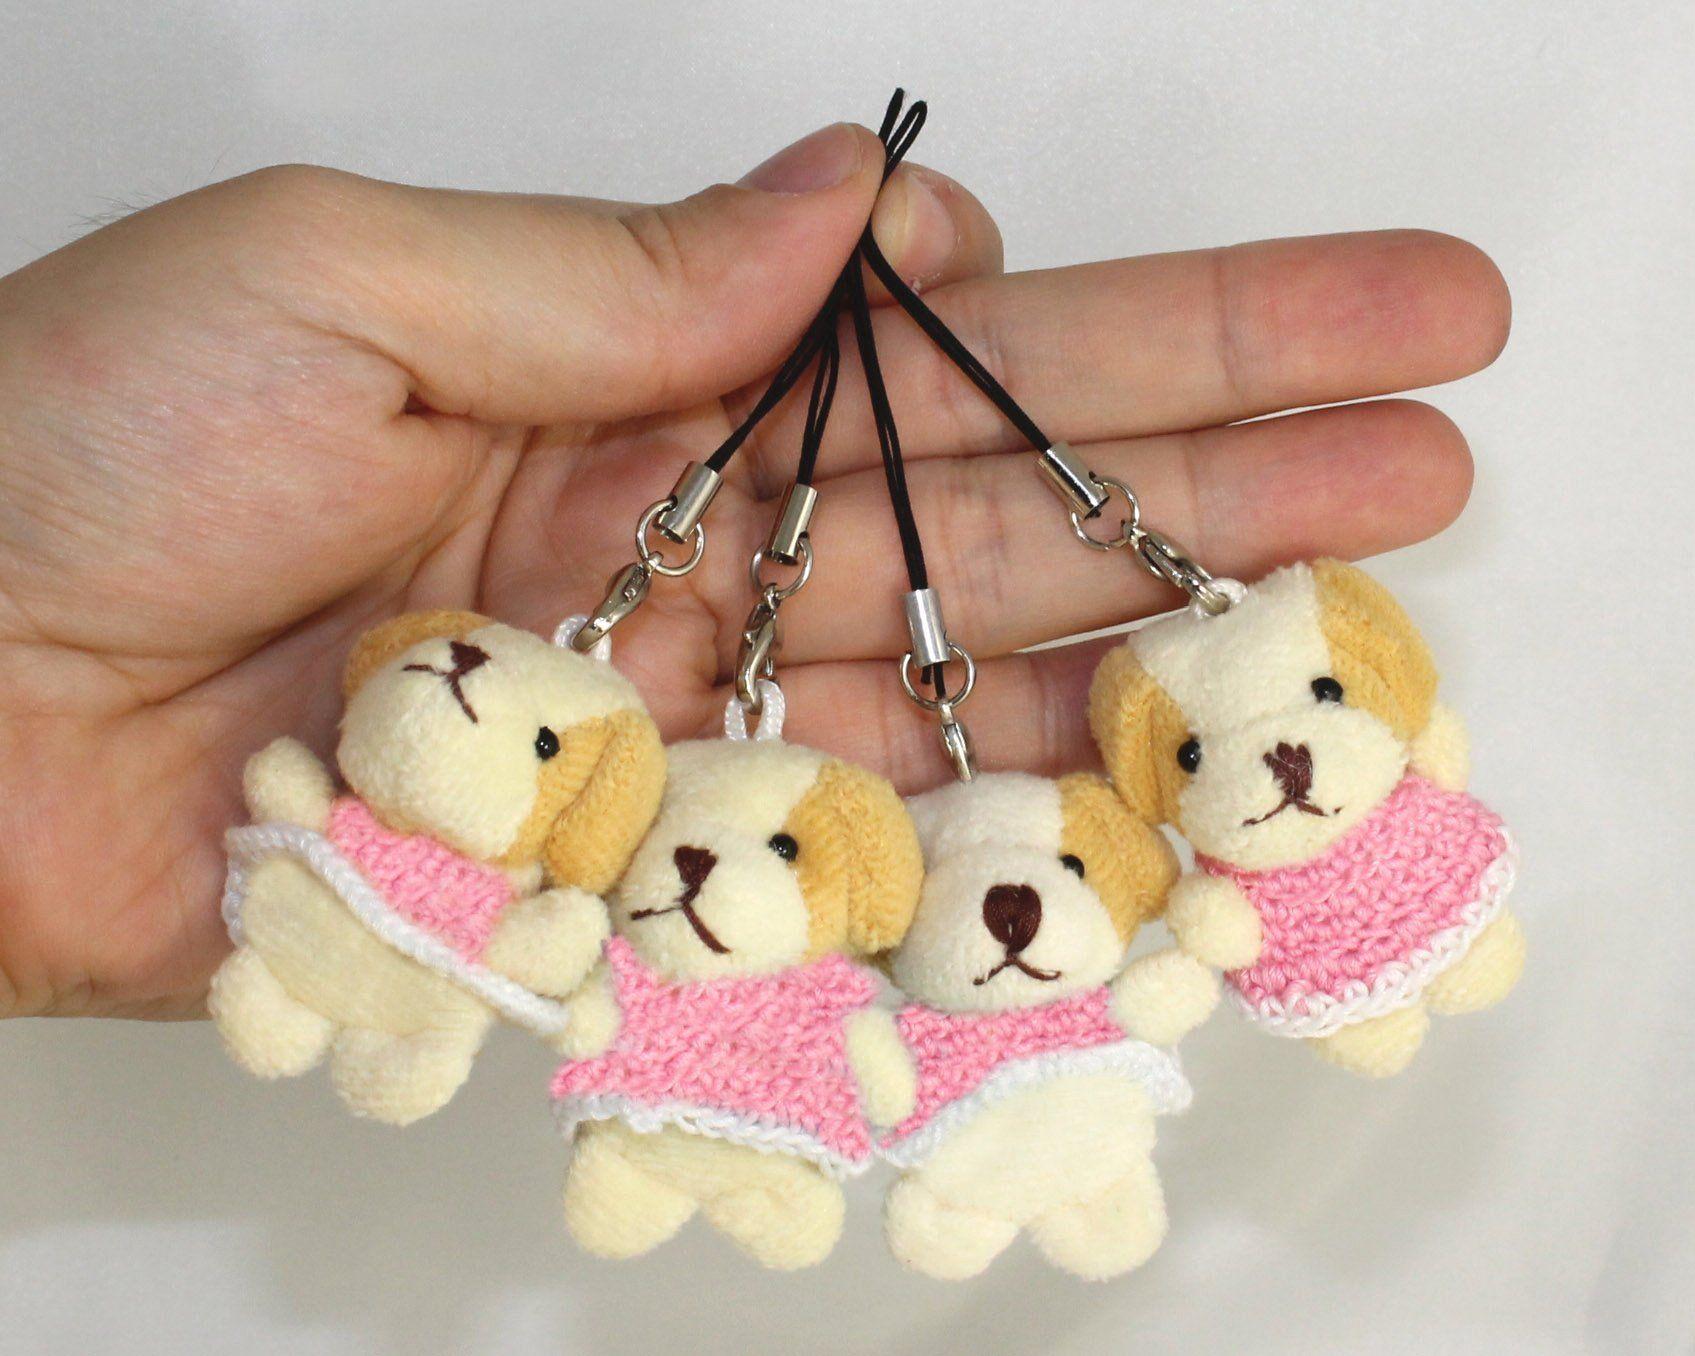 Lucore Mini 2 Puppy Dog Plush Stuffed Animal Toy Charms 4 Pcs Phone And Purse Decorations W Dust Plugs Cl Purse Decorations Pet Toys Plush Stuffed Animals [ 1356 x 1695 Pixel ]